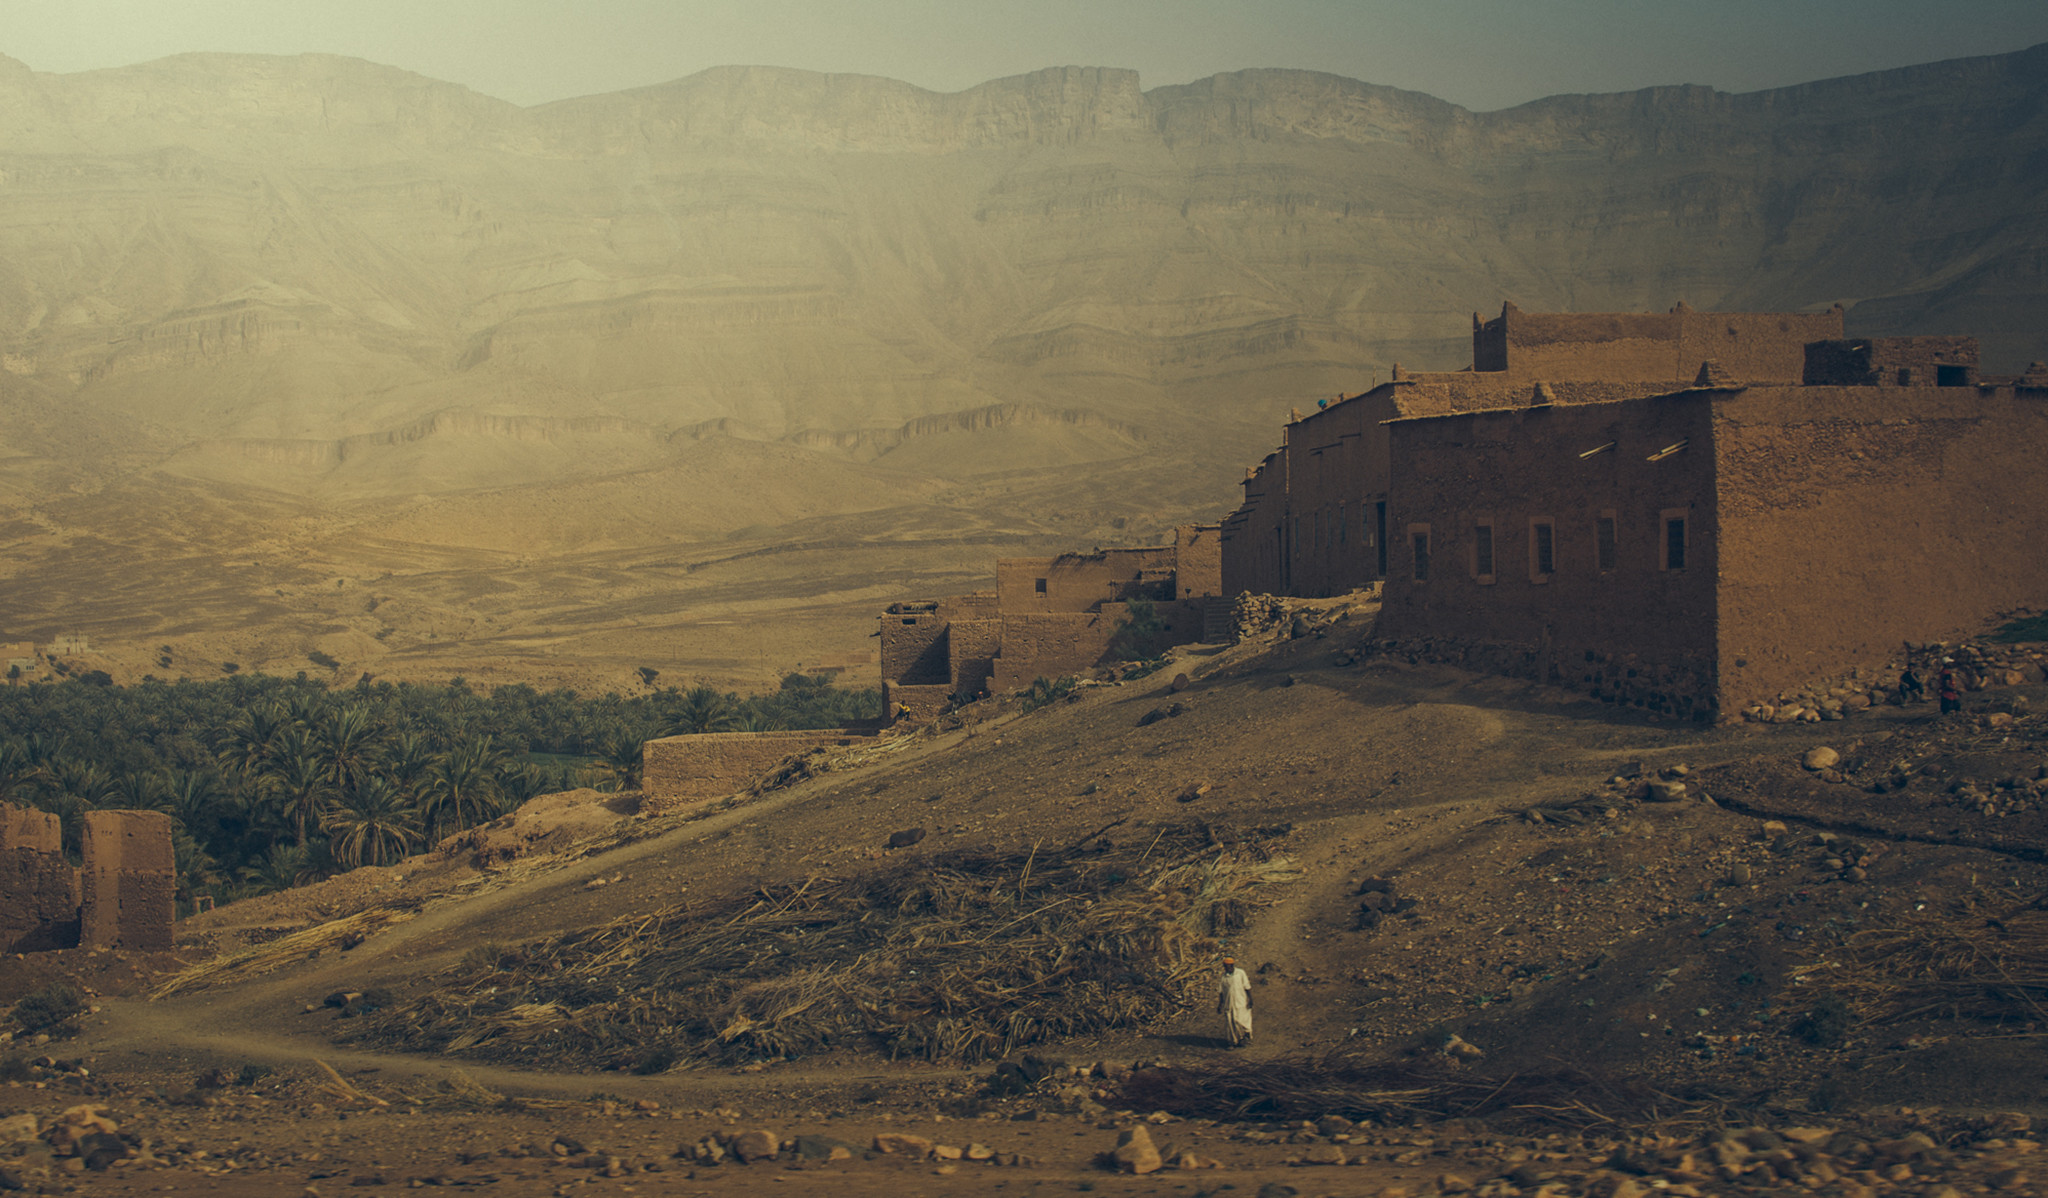 Zagora Desert by Luca Zizioli Freelance Photographer